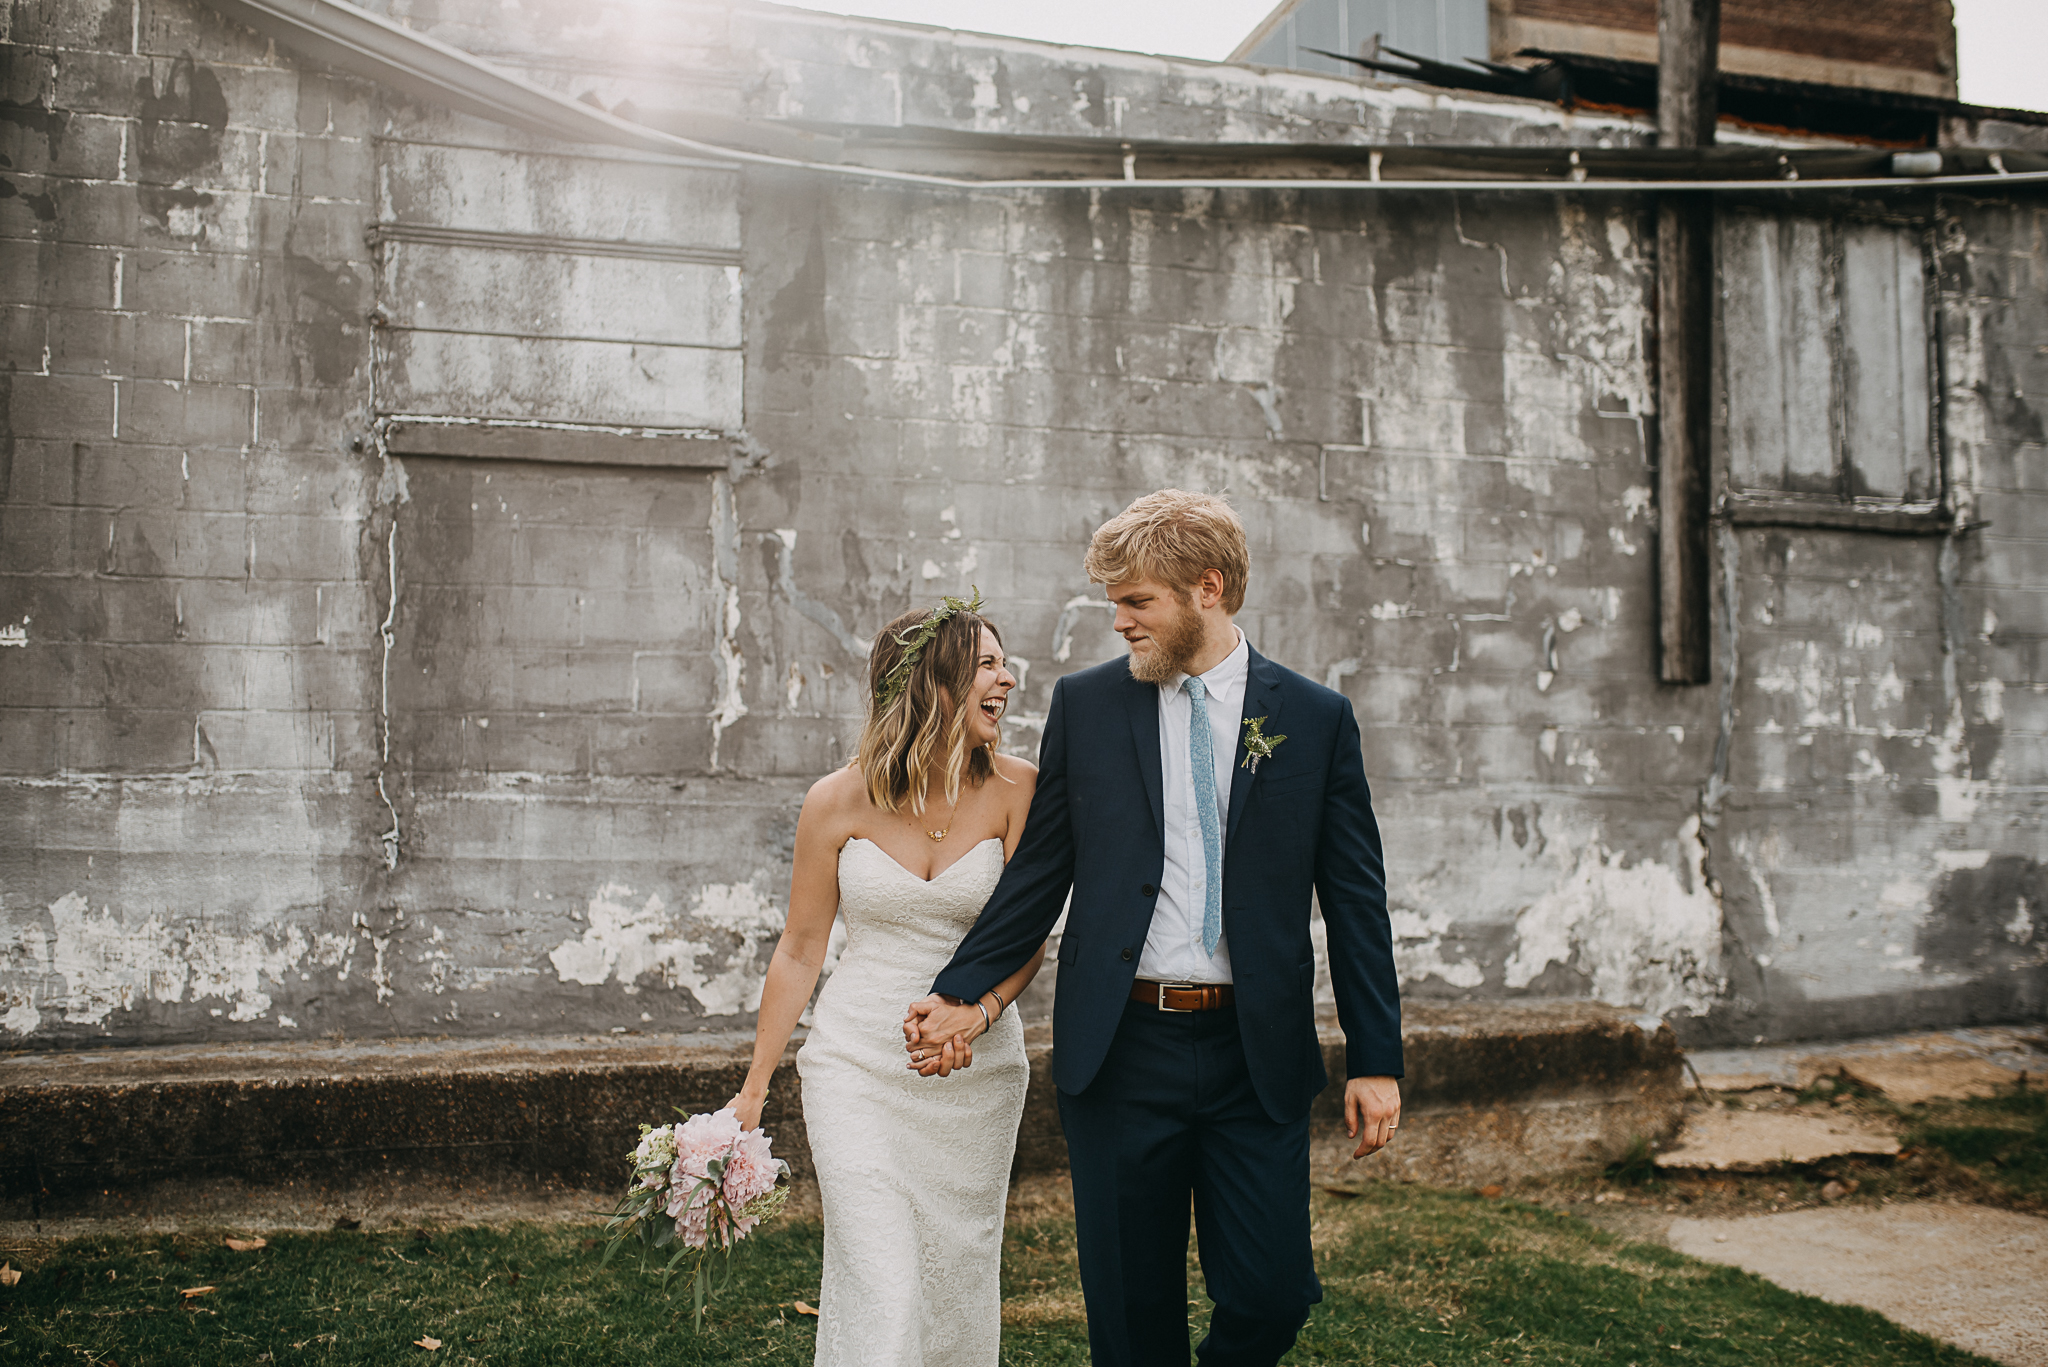 Meg&Clay_Loflin_Yard_Wedding_Ashley_Benham_Photography-69.jpg